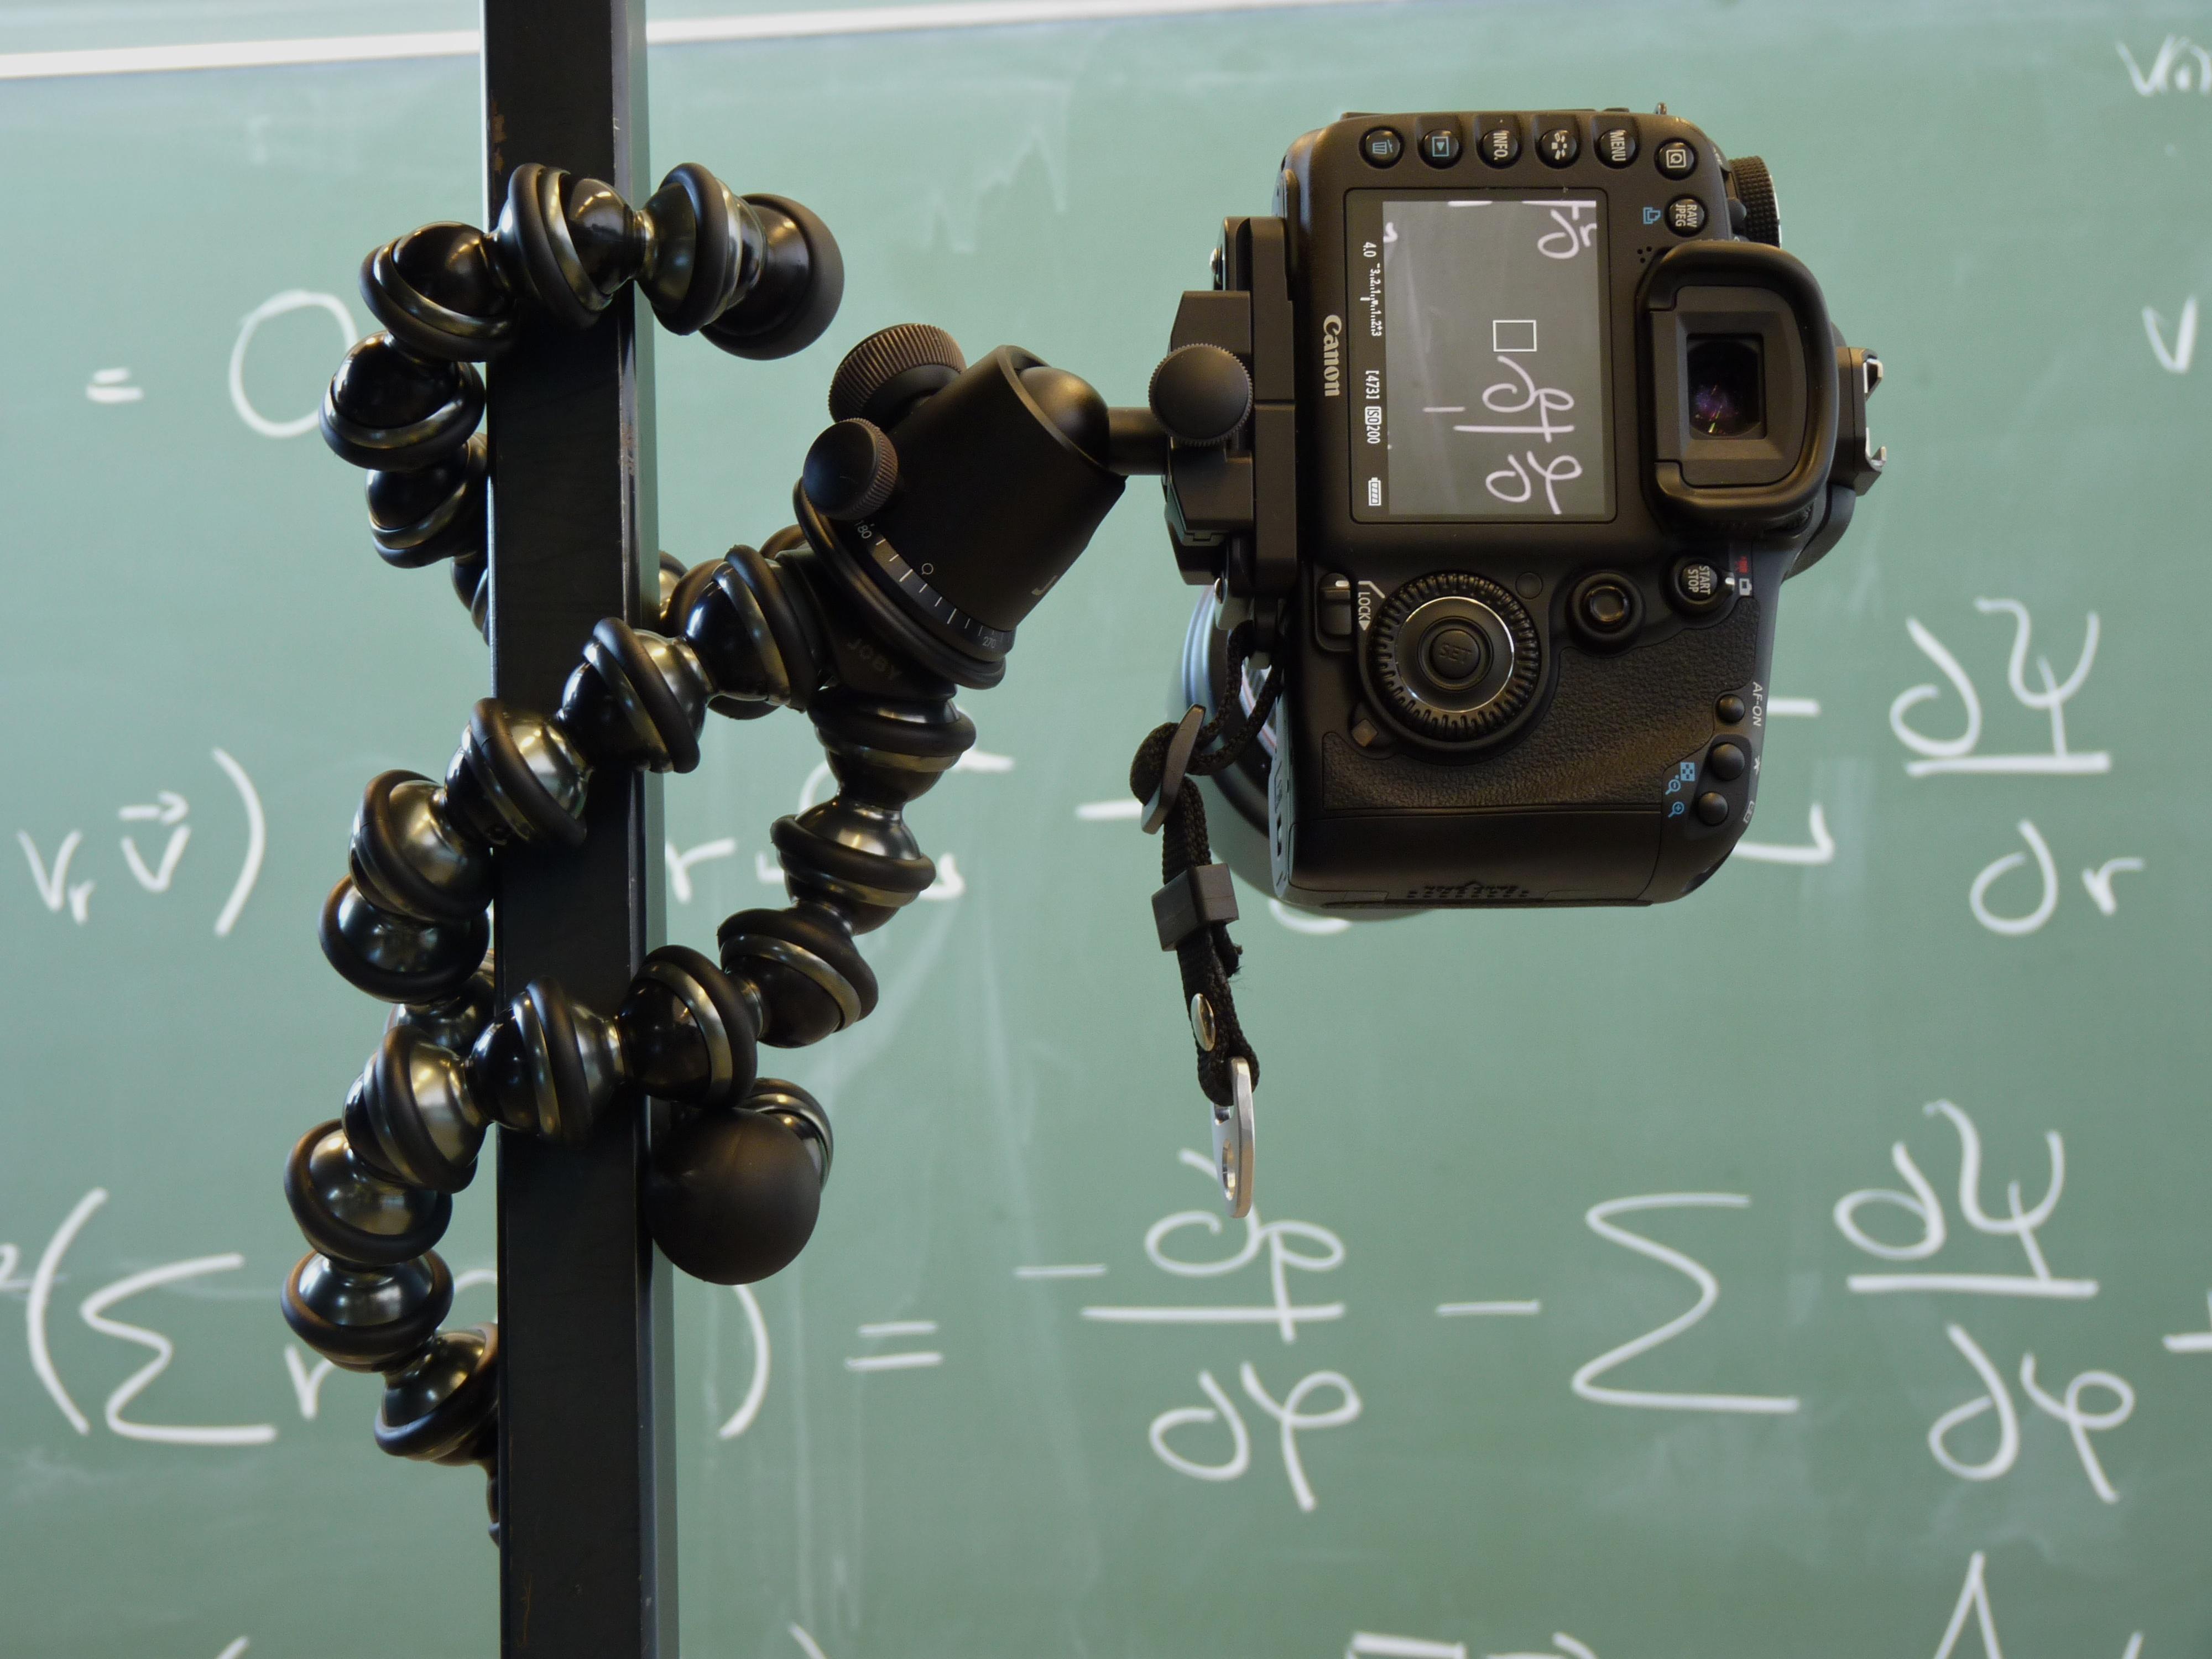 Canon EOS 7D mounted on GorillaPod Focus